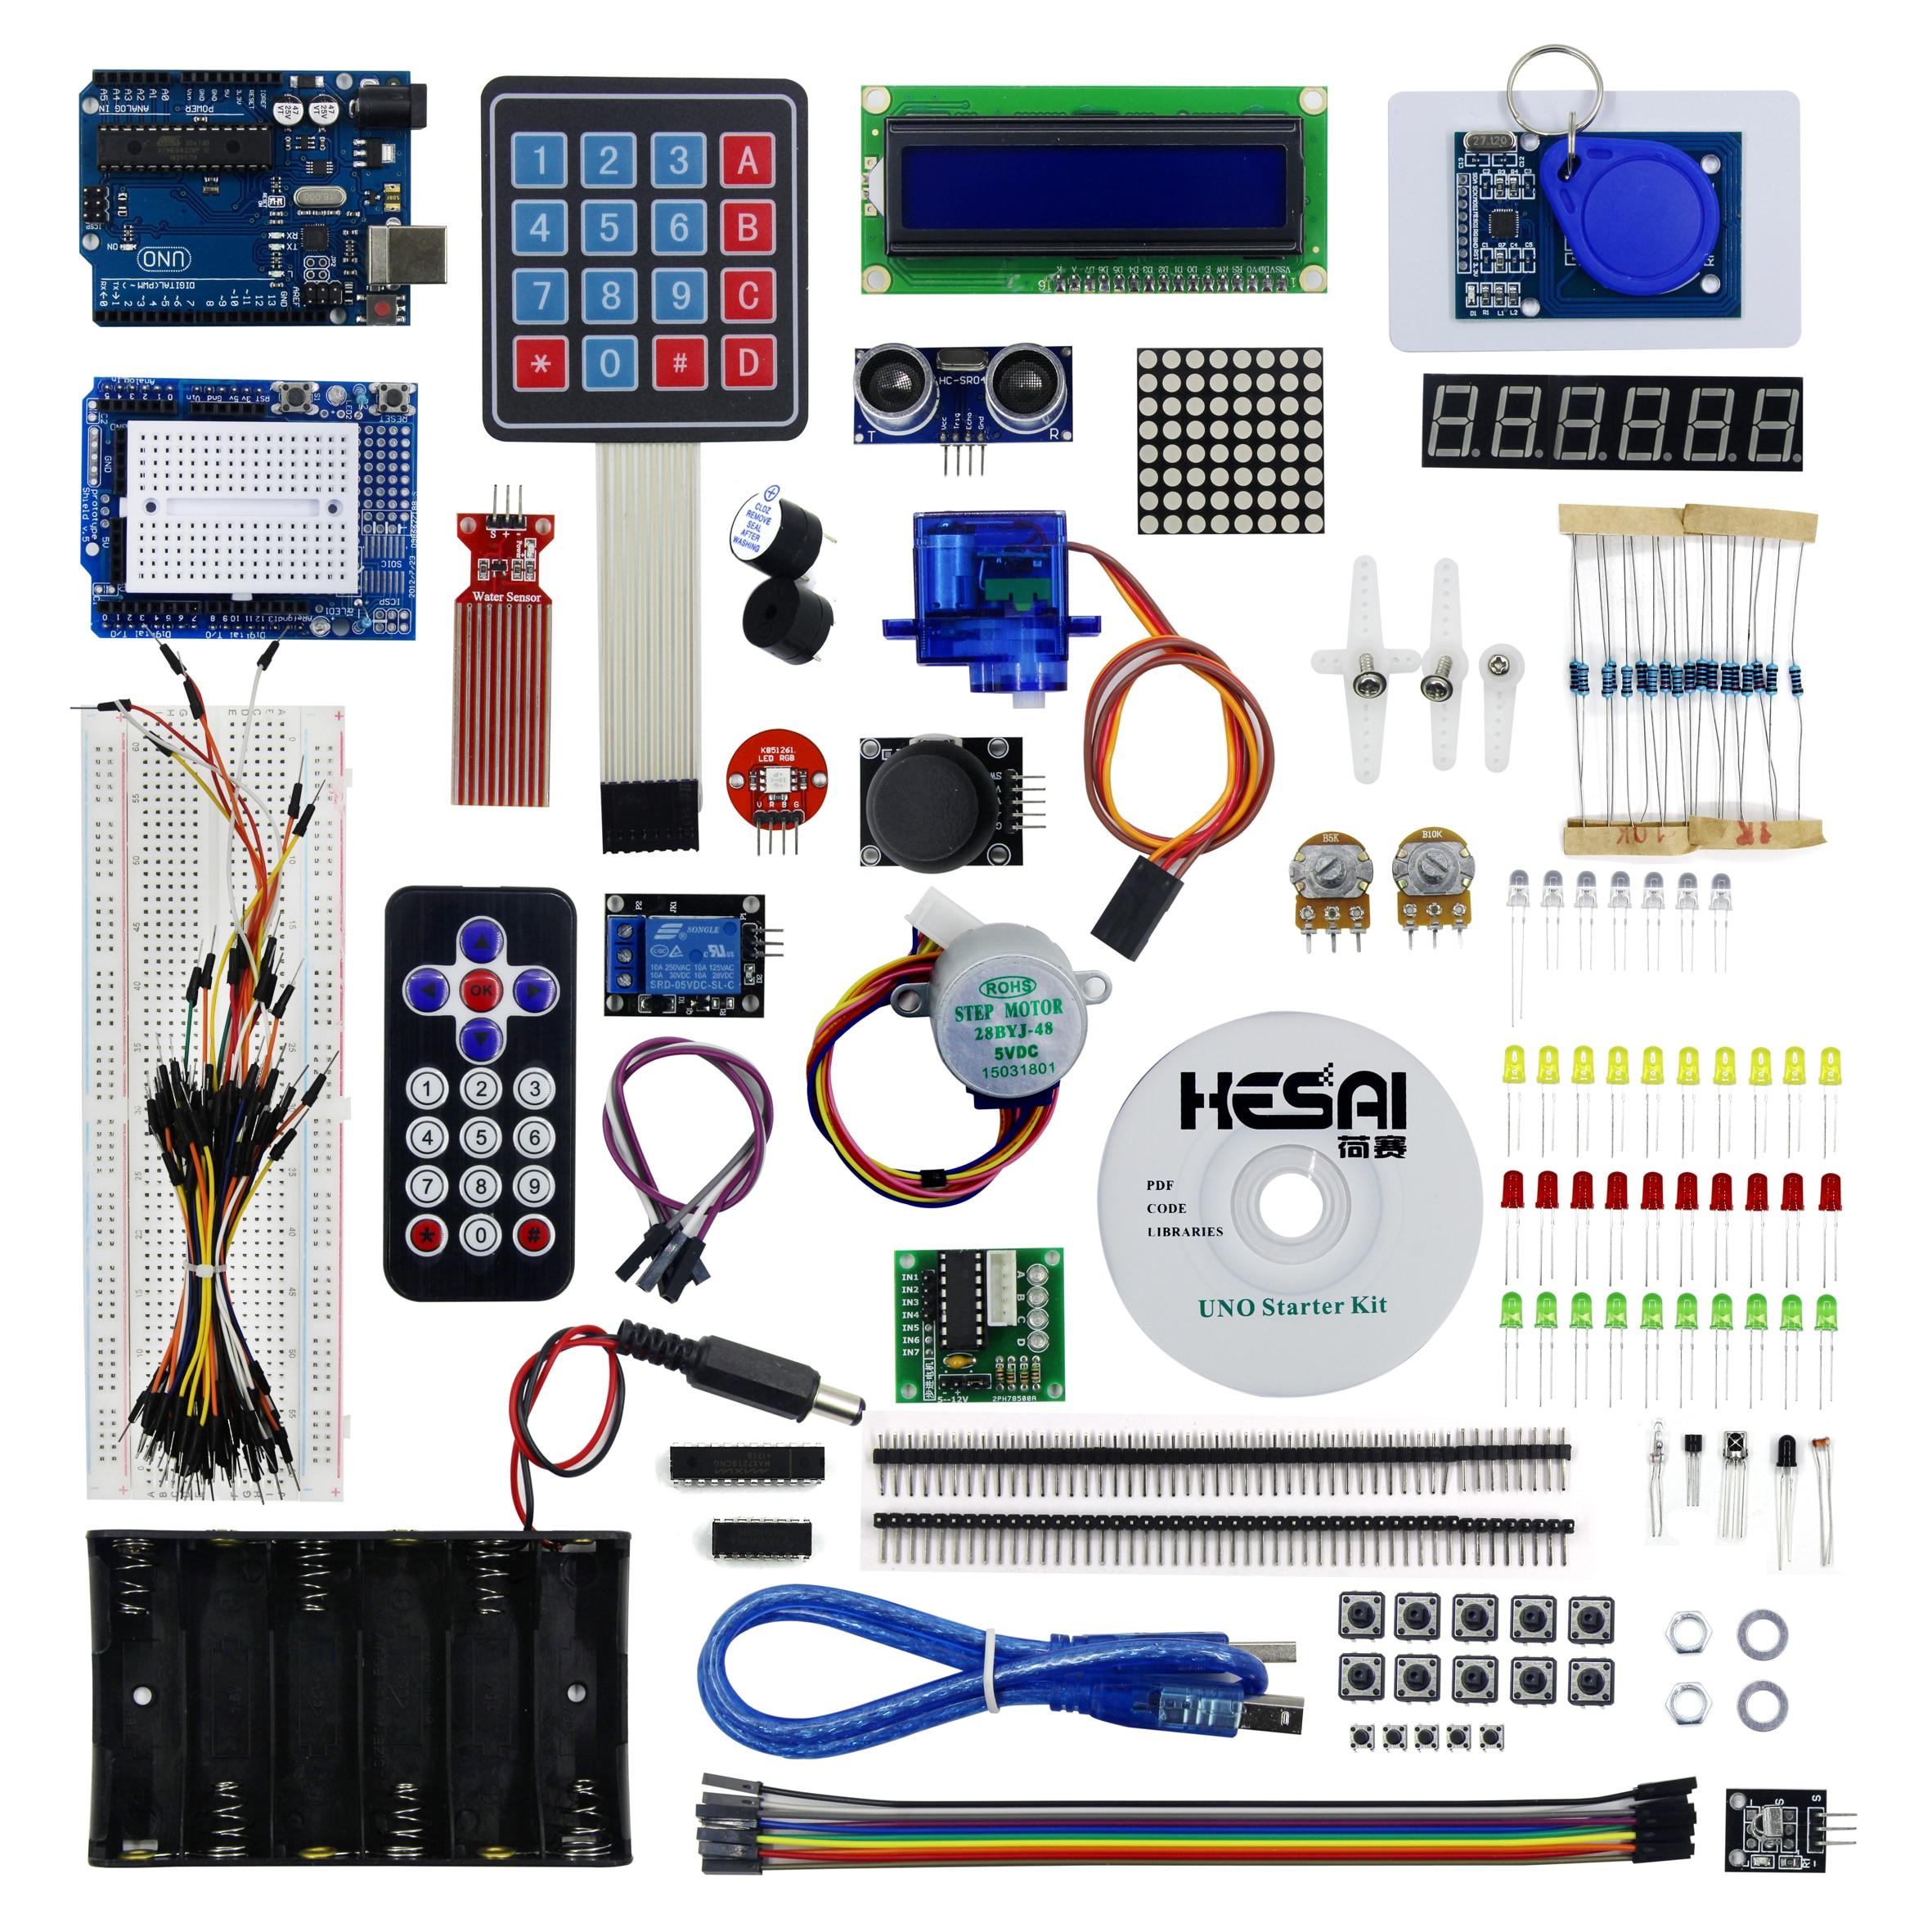 Starter Kit Uno R3 Breadboard And Holder Step Motor / Servo /1602 LCD / Jumper Wire Uno R3 Starter Kit